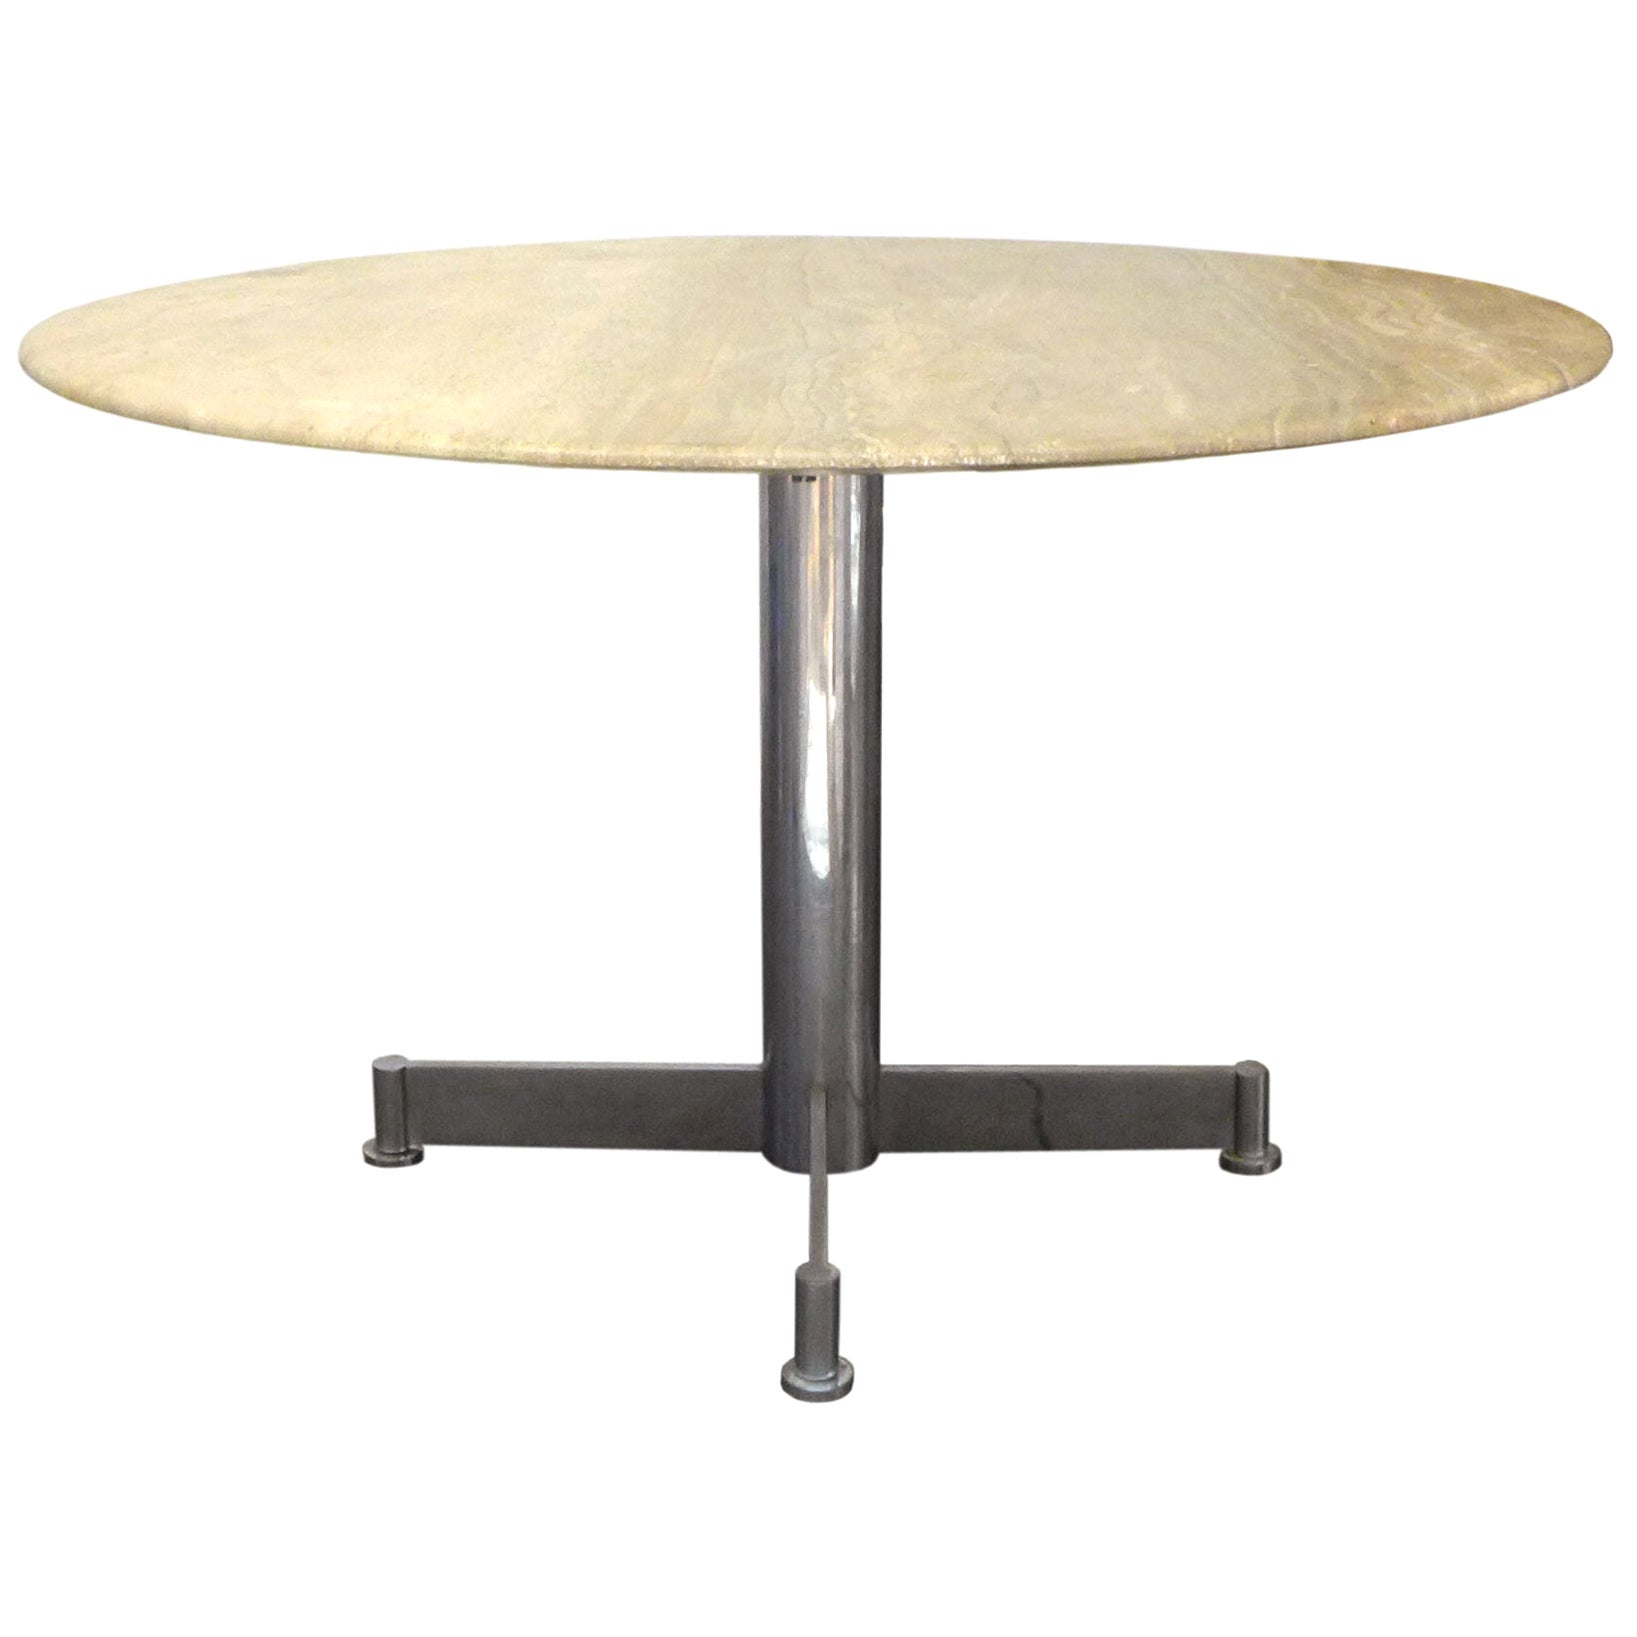 Travertine & Chrome Steel Round Dining Table